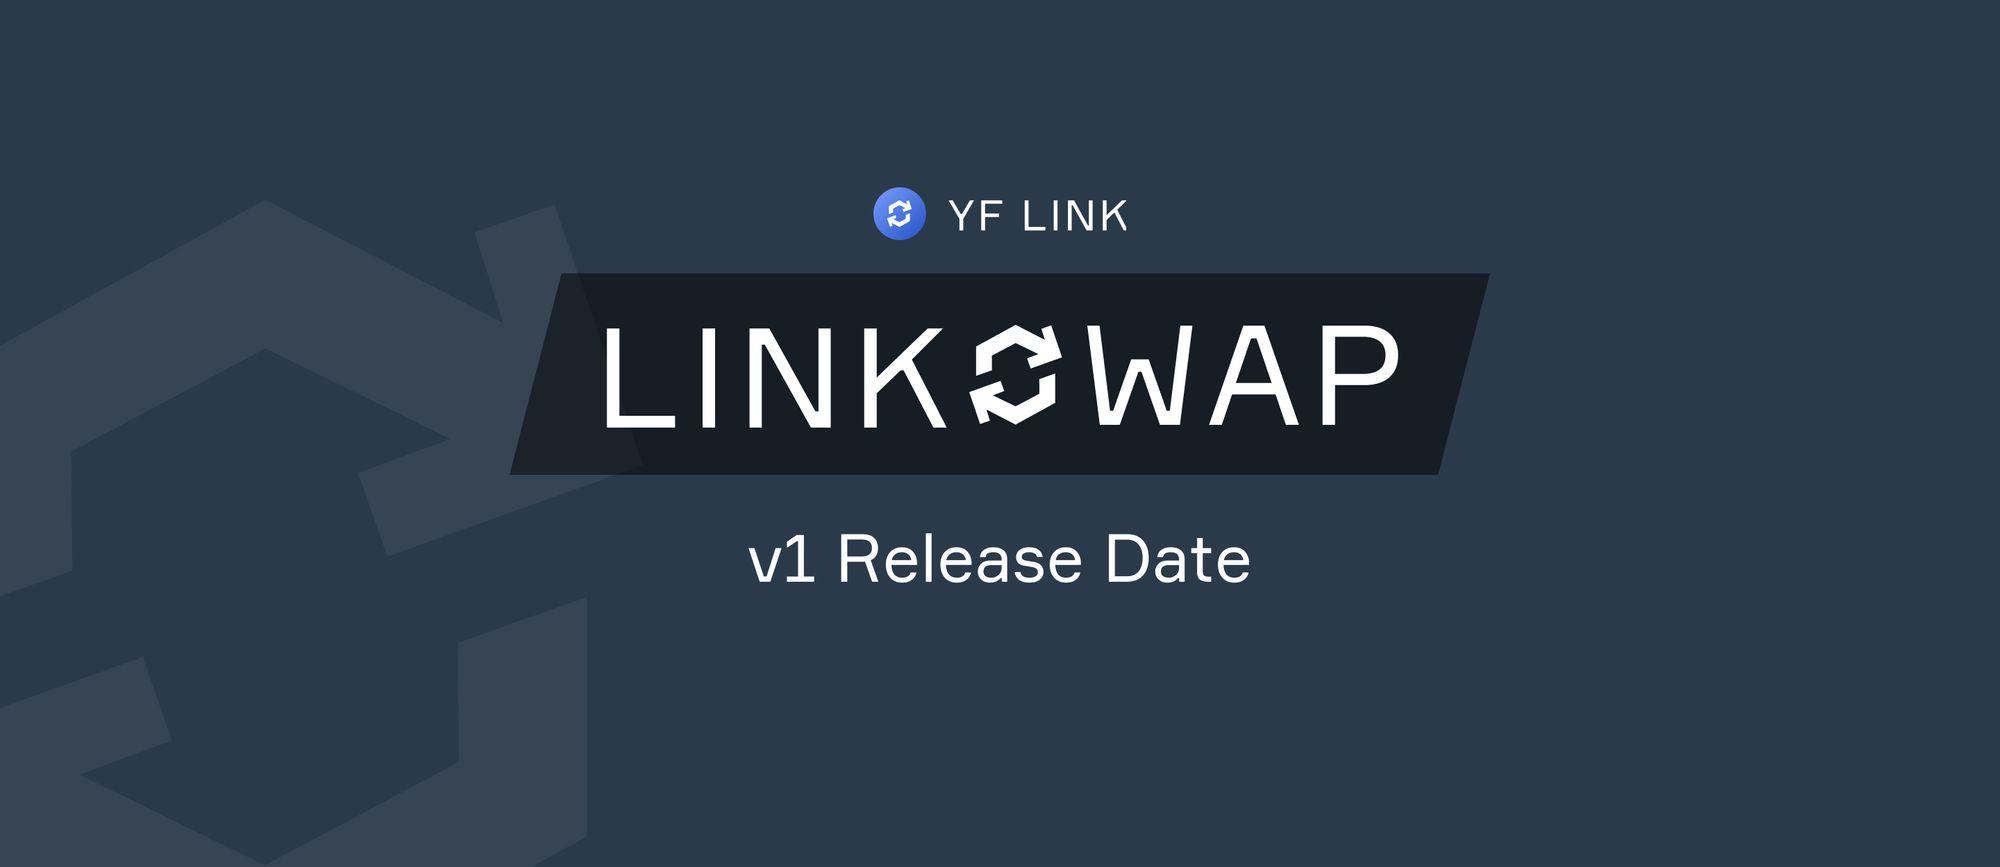 LINKSWAP Announcement & Official Release Date